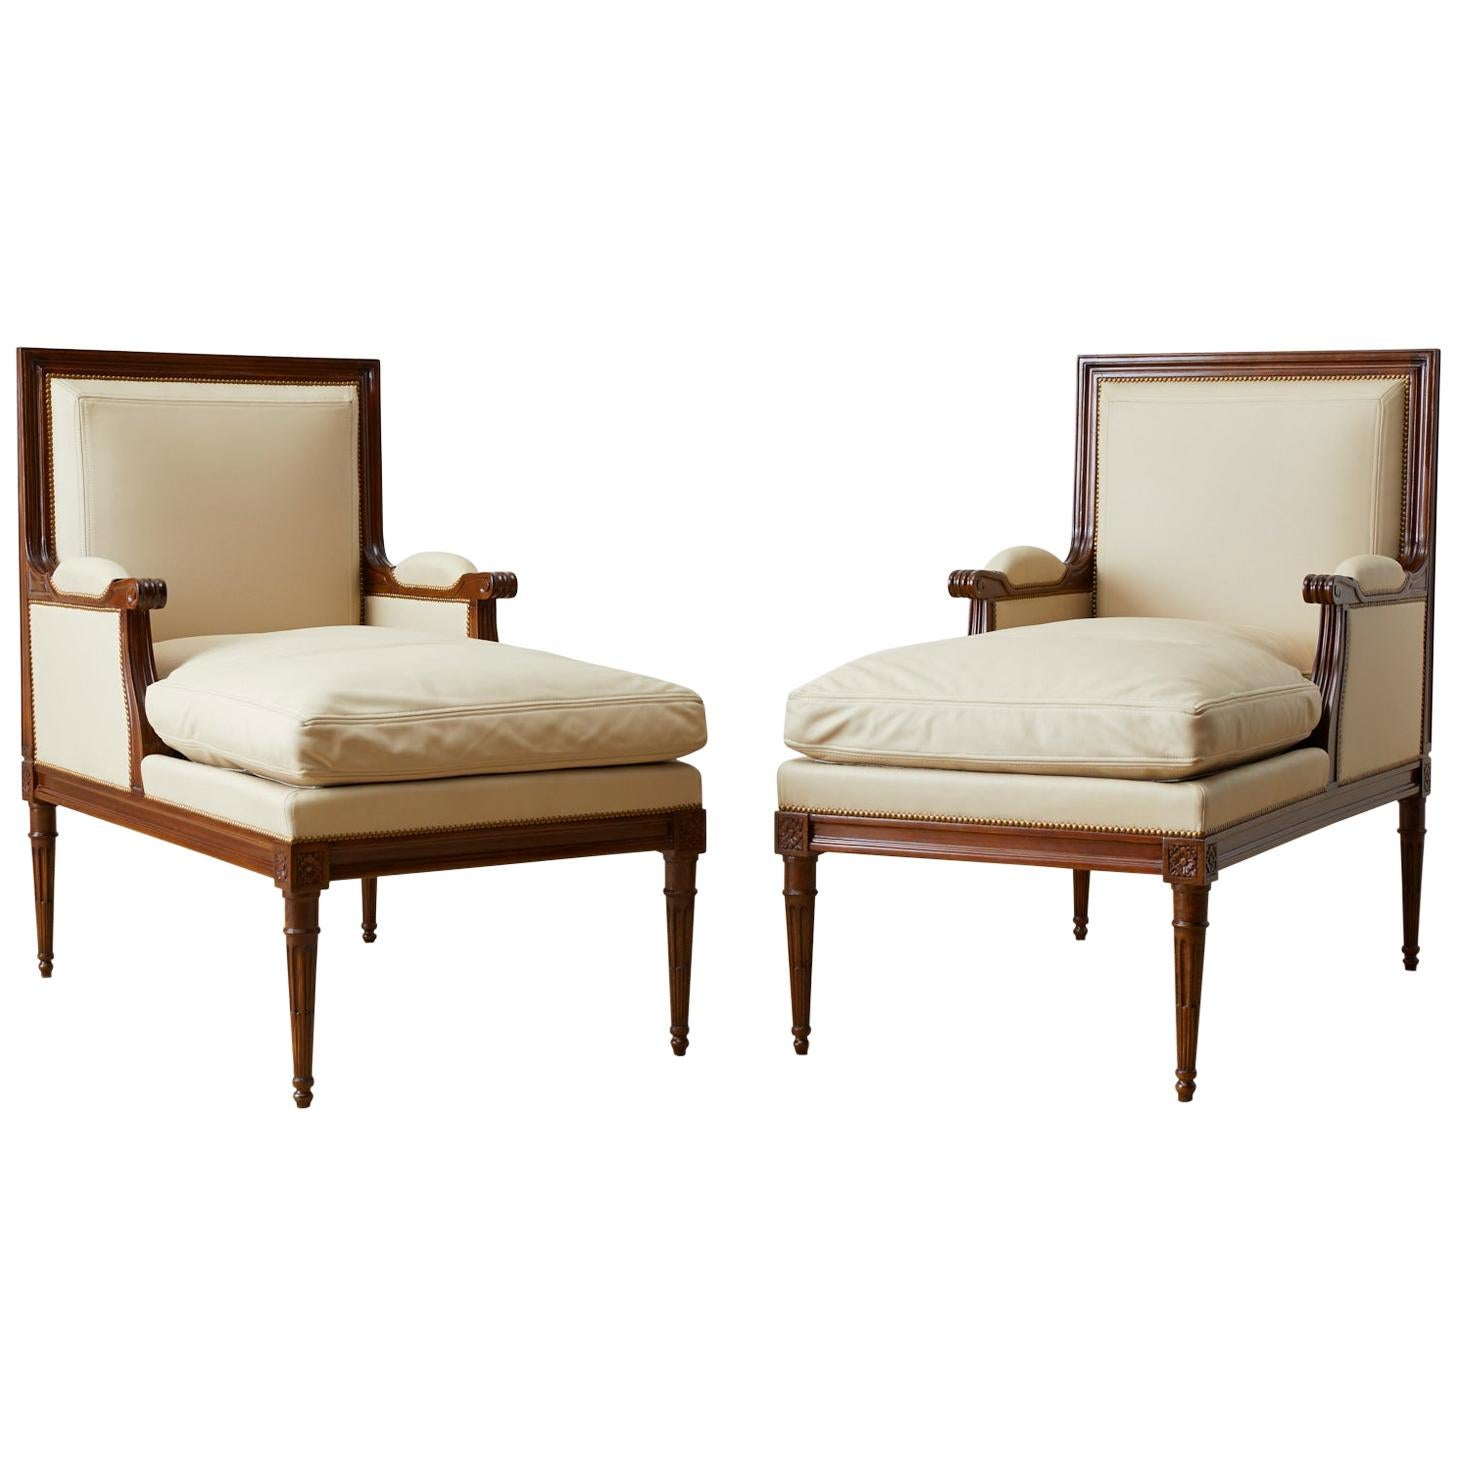 Pair of Maison Jansen Louis XVI Style Long Bergere Armchairs